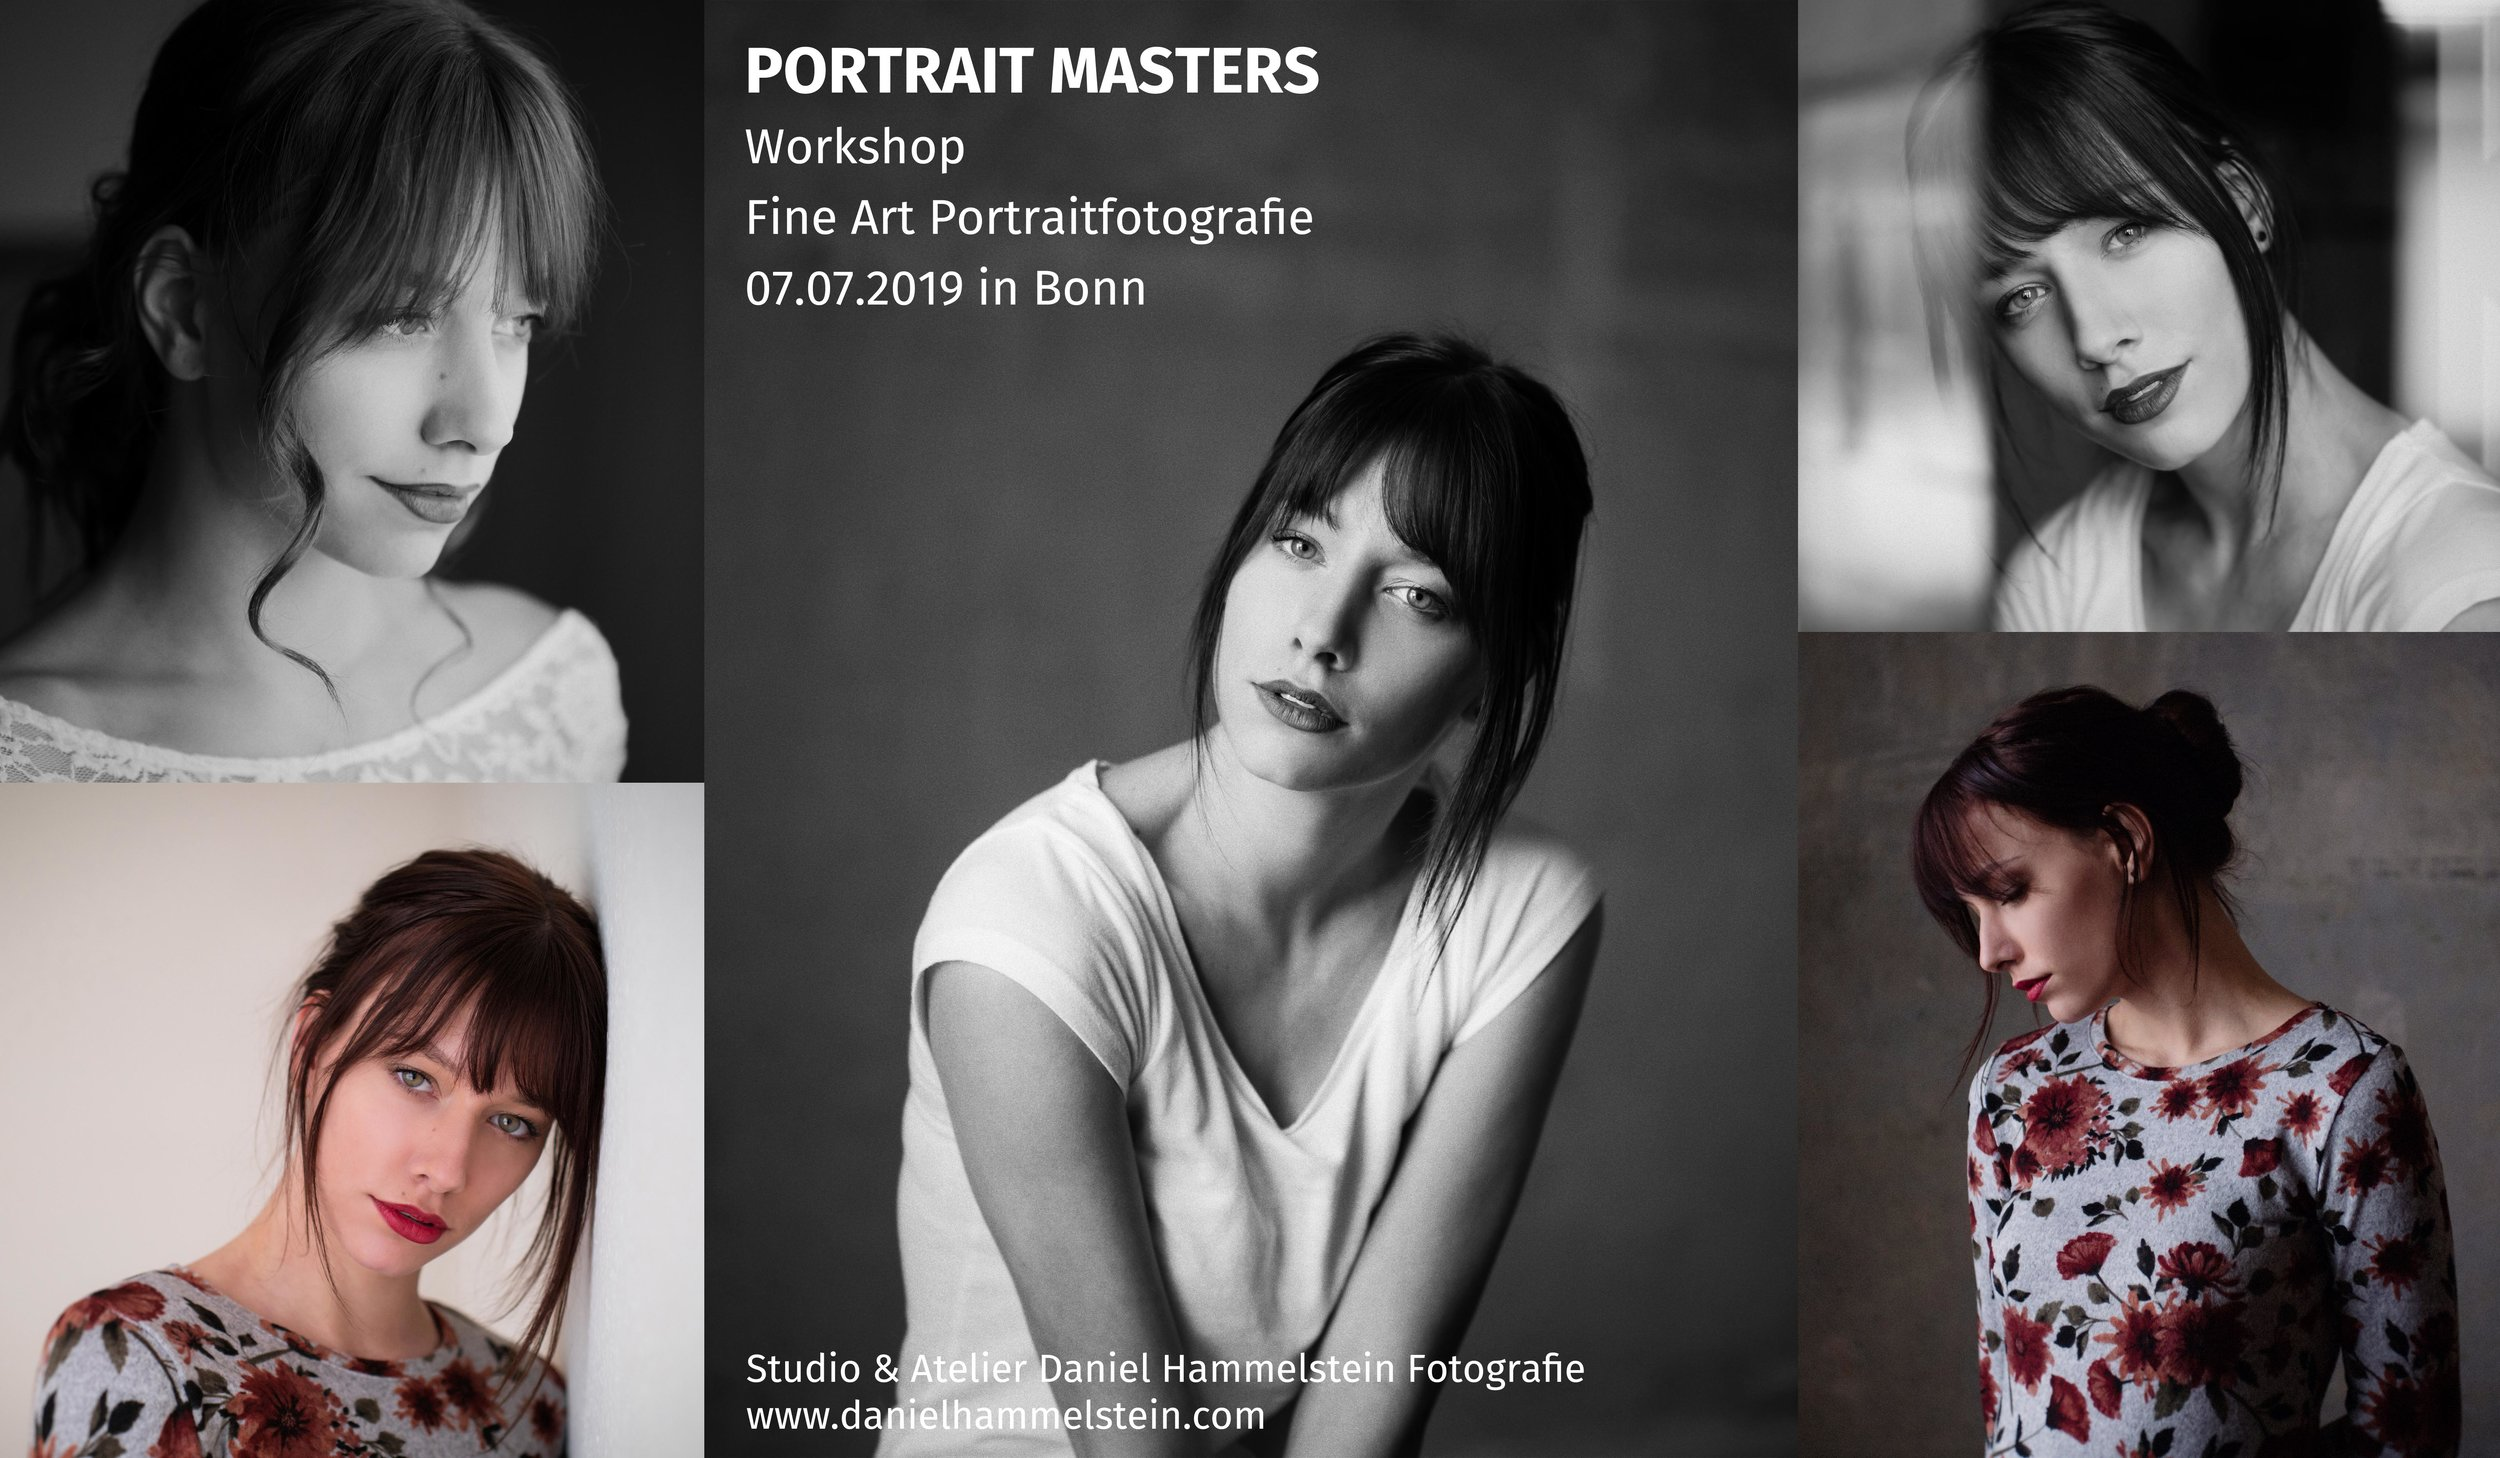 Portrait Workshop Portraitfotografie Schwarzweissfotografie Fotoworkshop Fotokurs Bonn Köln Düsseldorf NRW Juli 2019.jpg